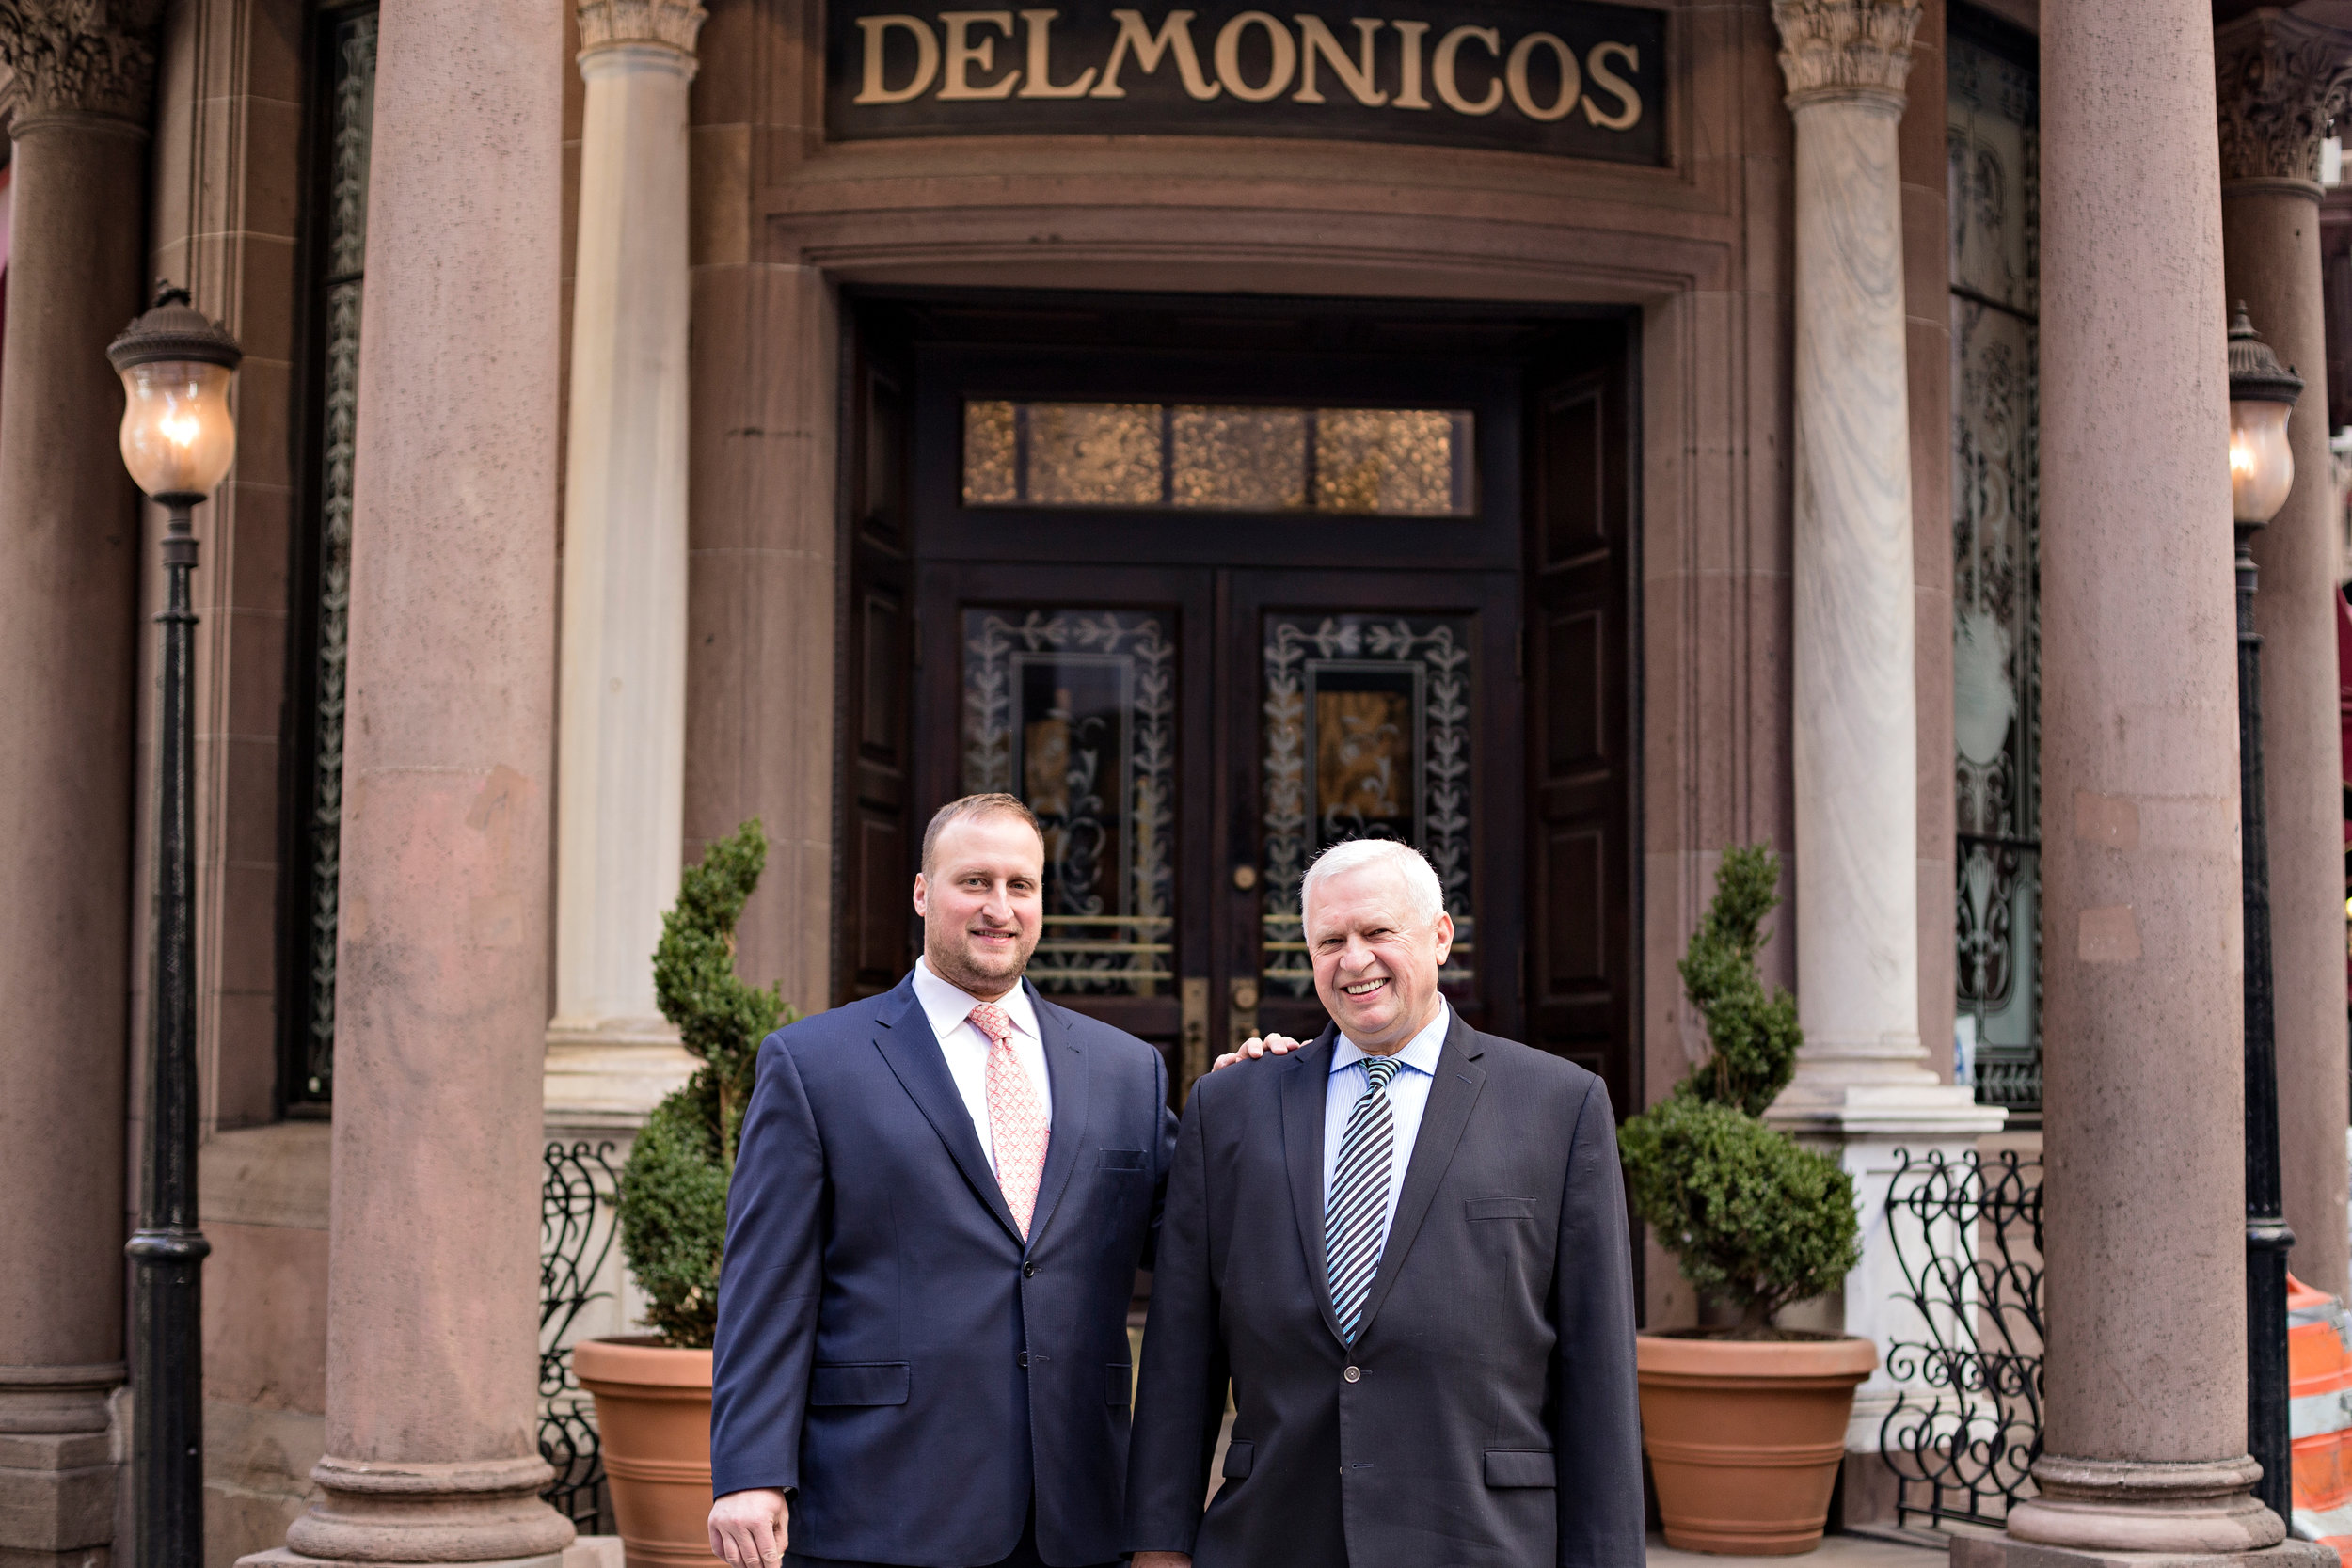 delmonicos2_downtownmag-6.jpg